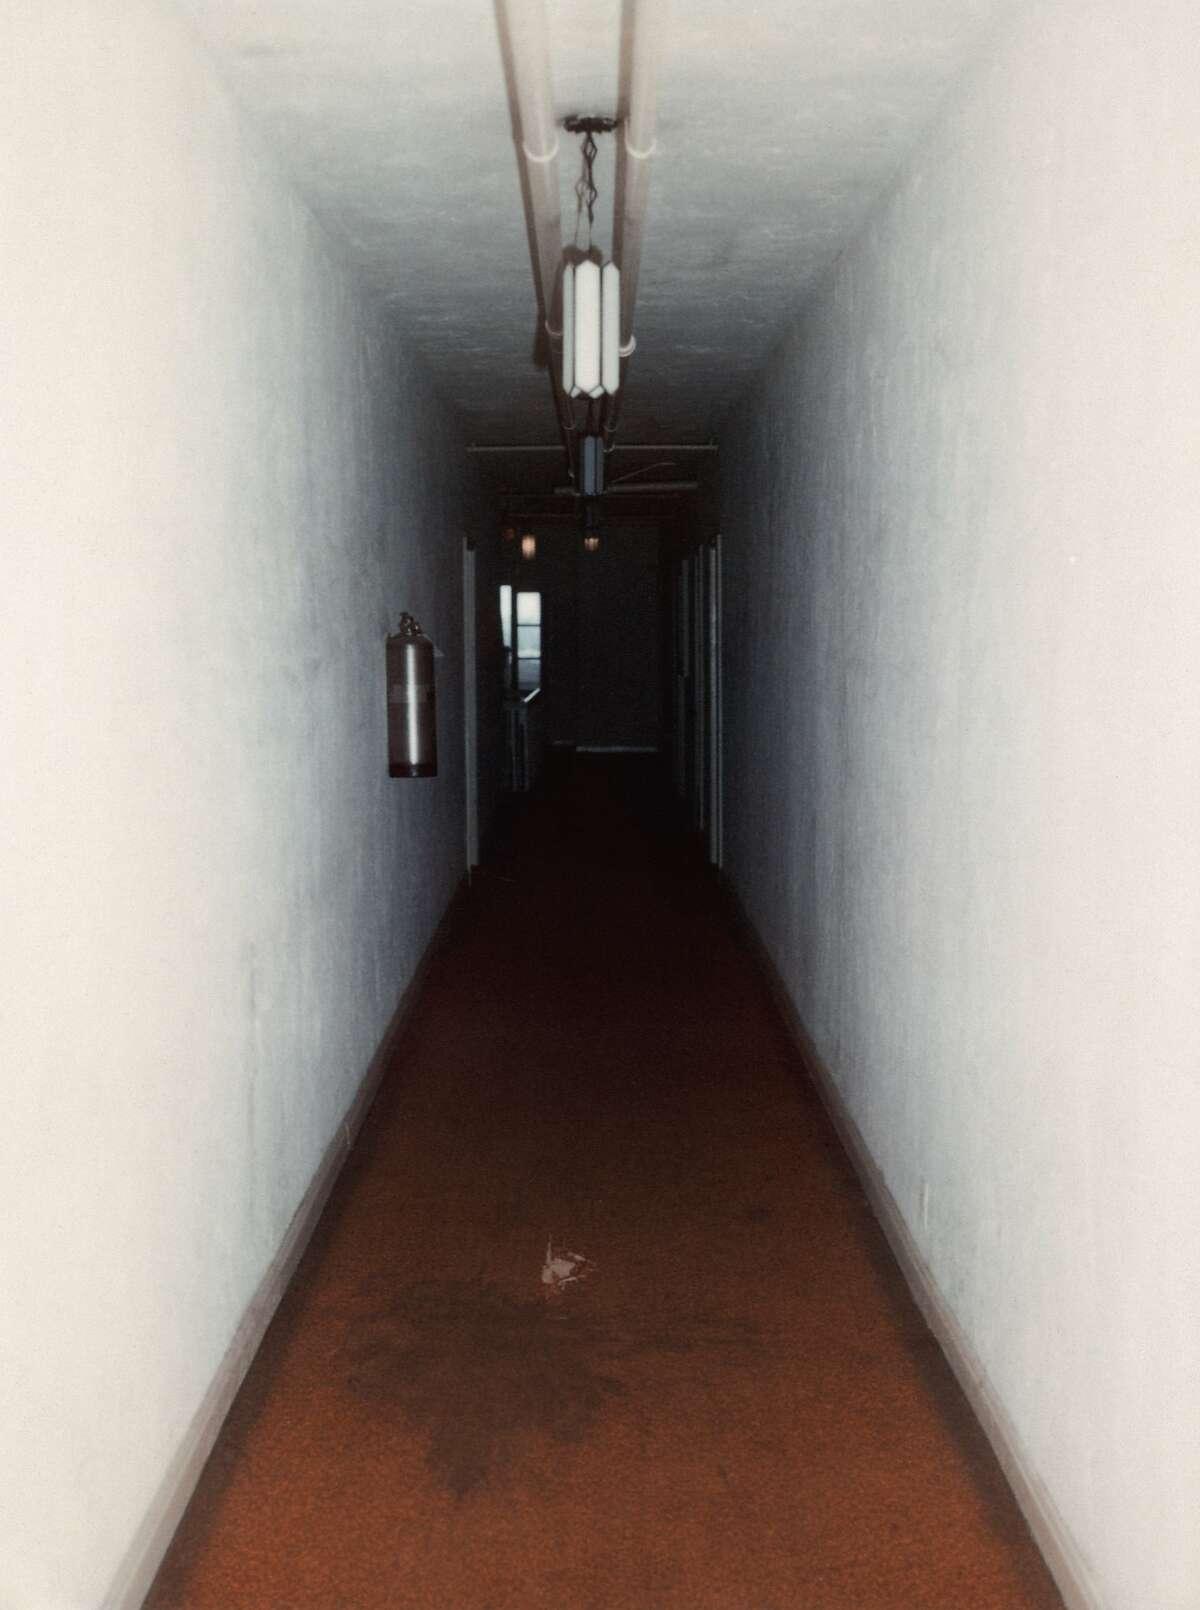 Steve Kahn, Corridors, 1980-2014Pigment print30 x 24 inches Edition 1/3